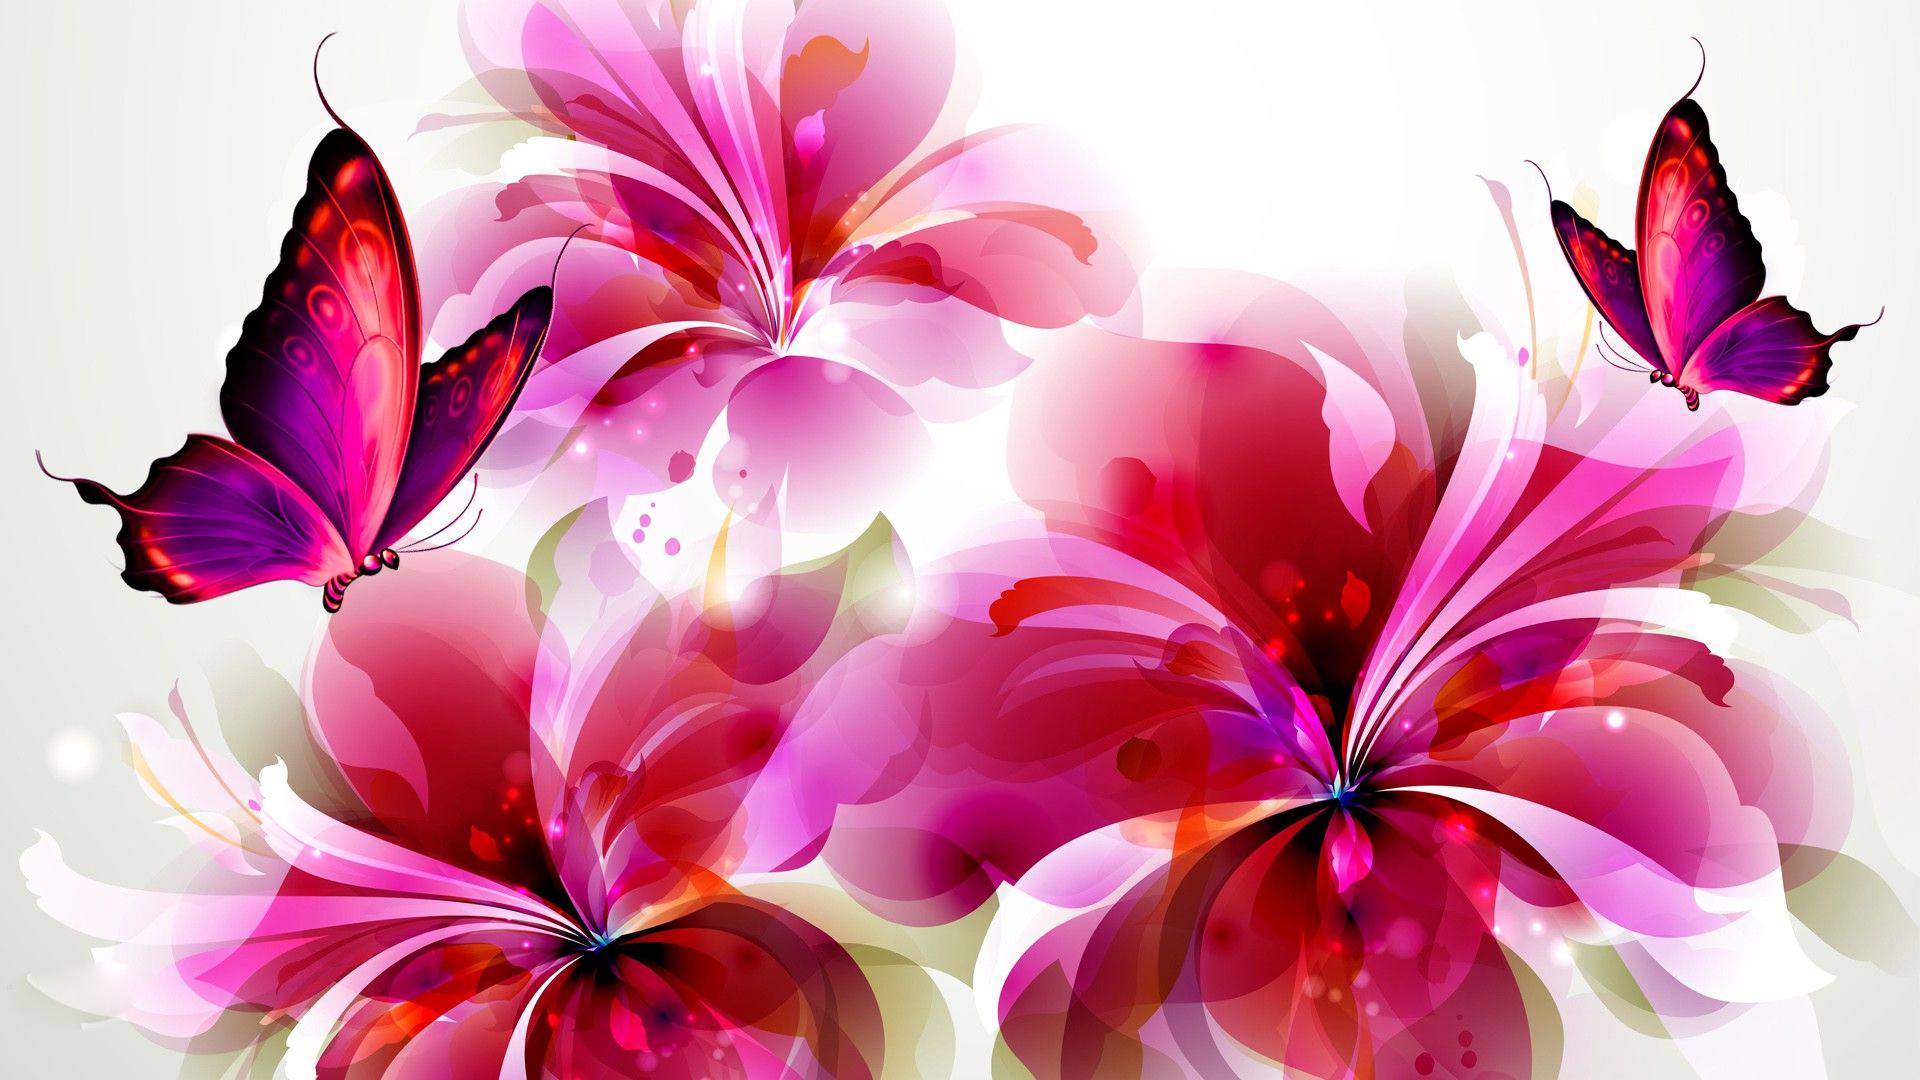 Pink Flowers and Butterflies HD Wallpaper | Background ...